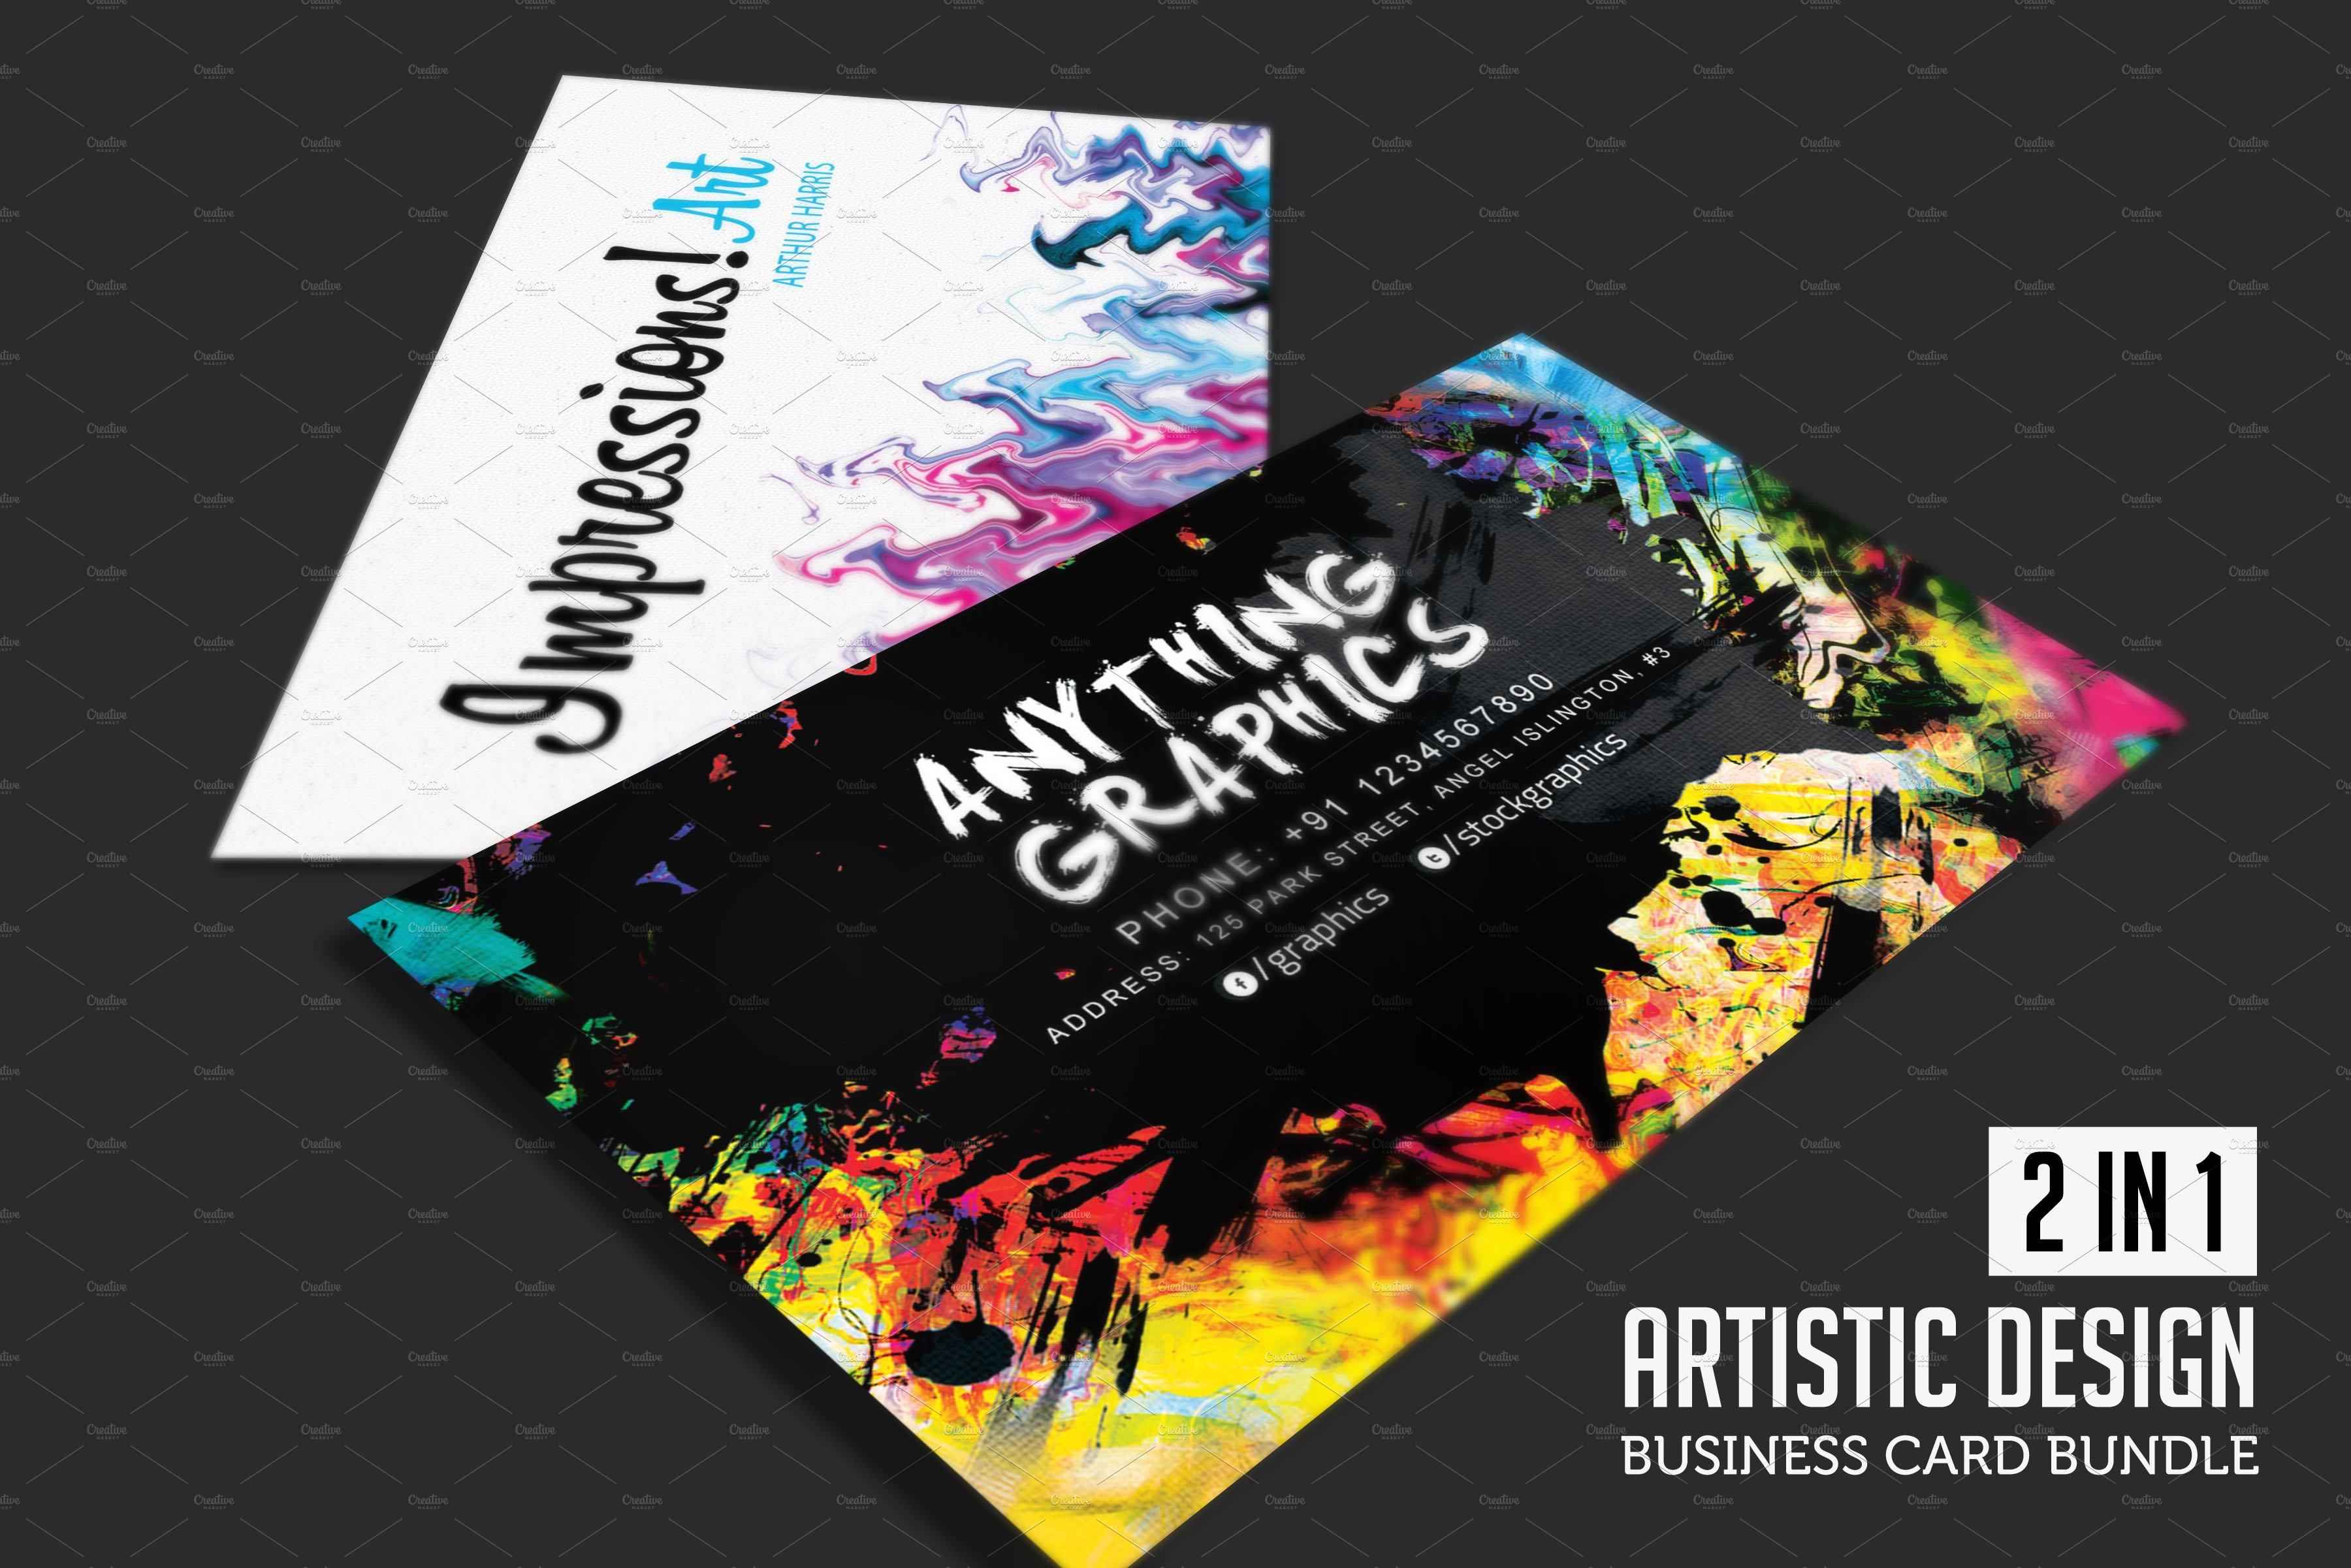 Artistic design business card bundle business card templates artistic design business card bundle business card templates creative market reheart Gallery